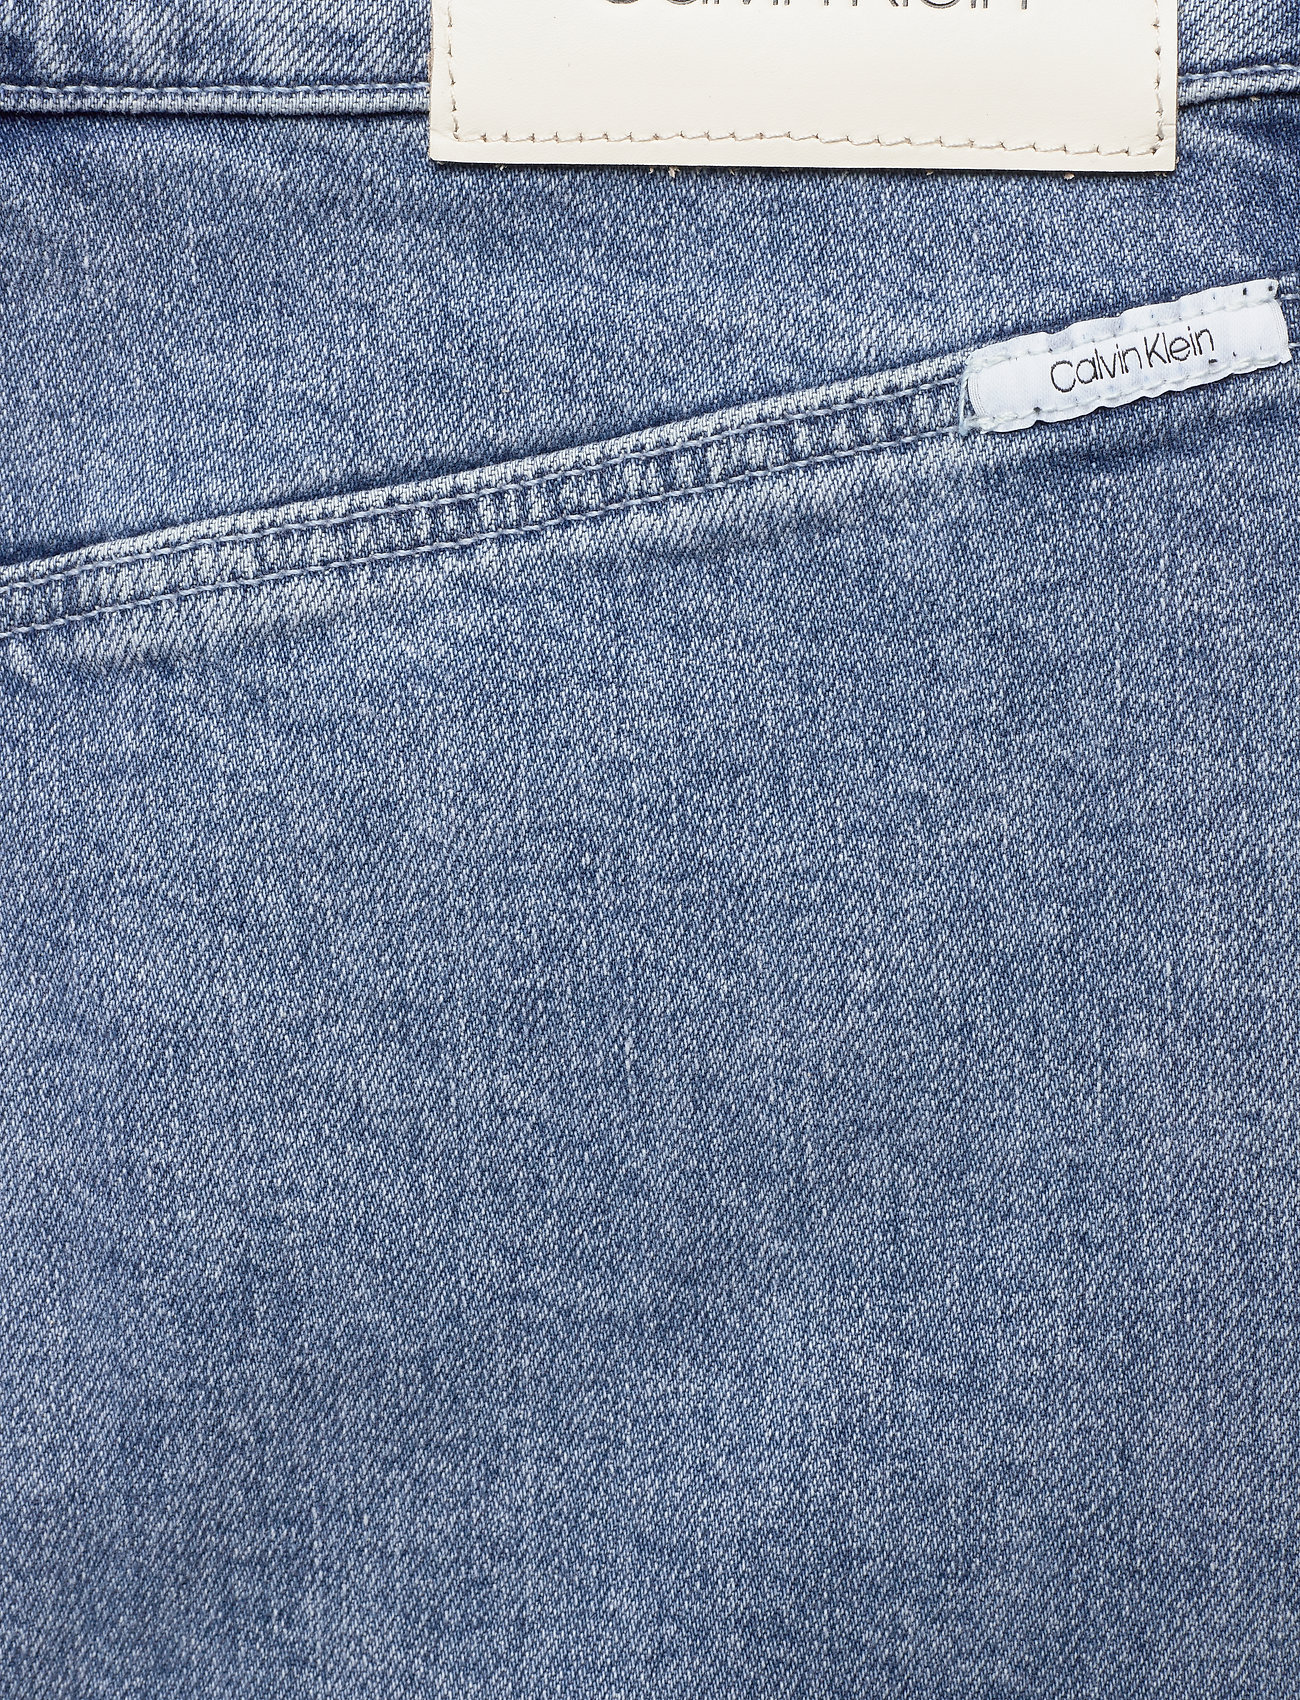 Calvin Klein BUTTON UP MIDI SKIRT - Skirts ICE CUBE DARK BLUE